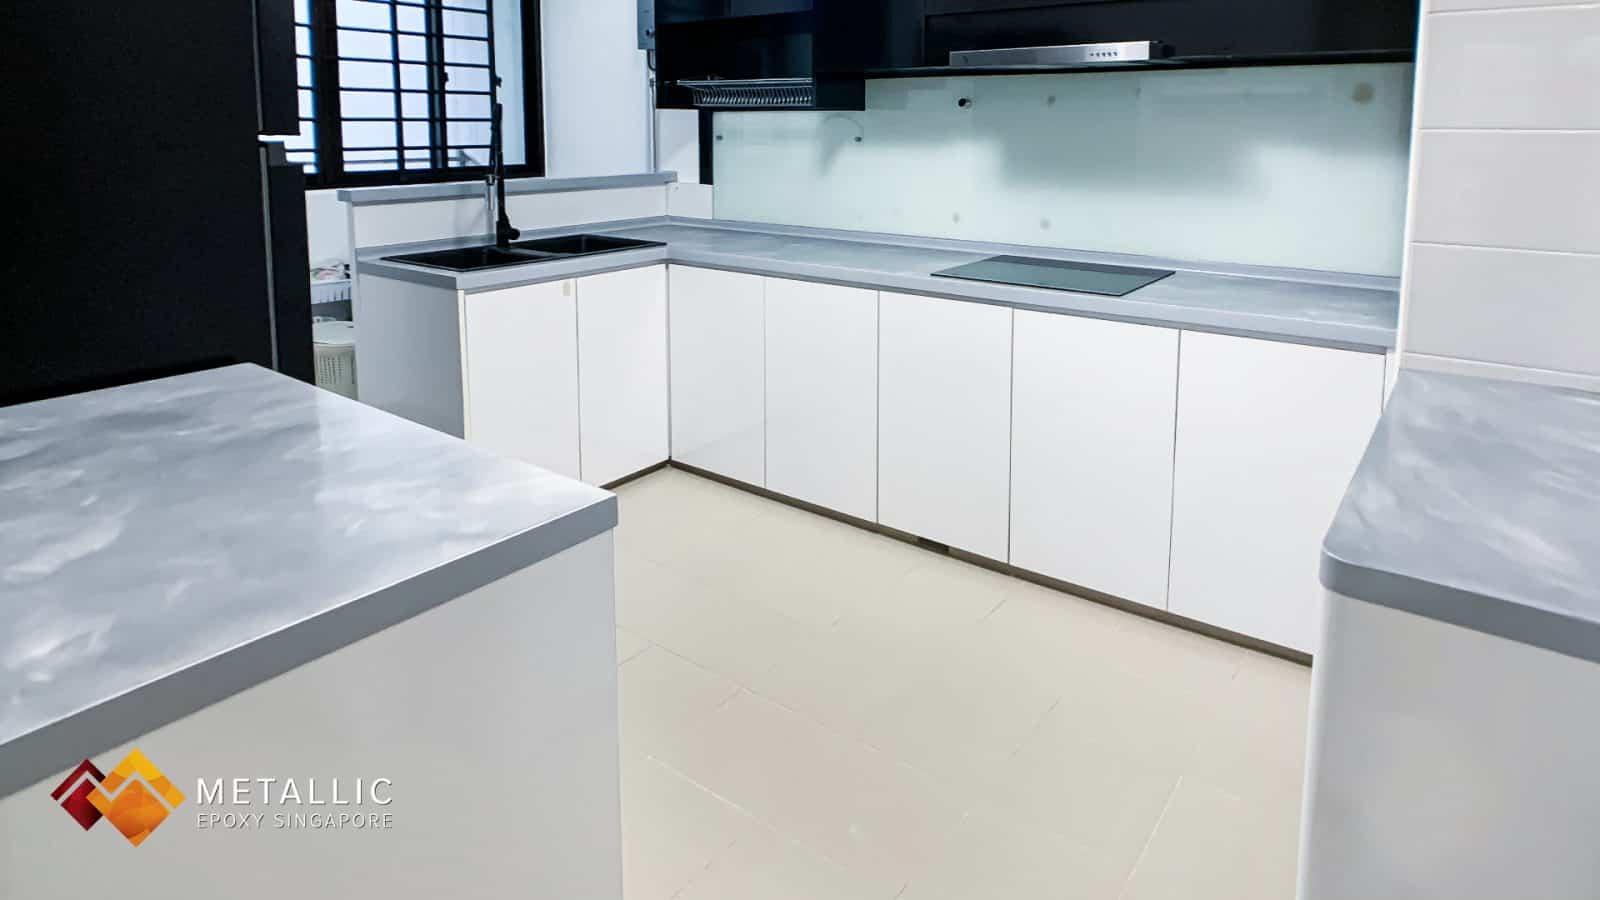 Silver Grey Swirl Countertop